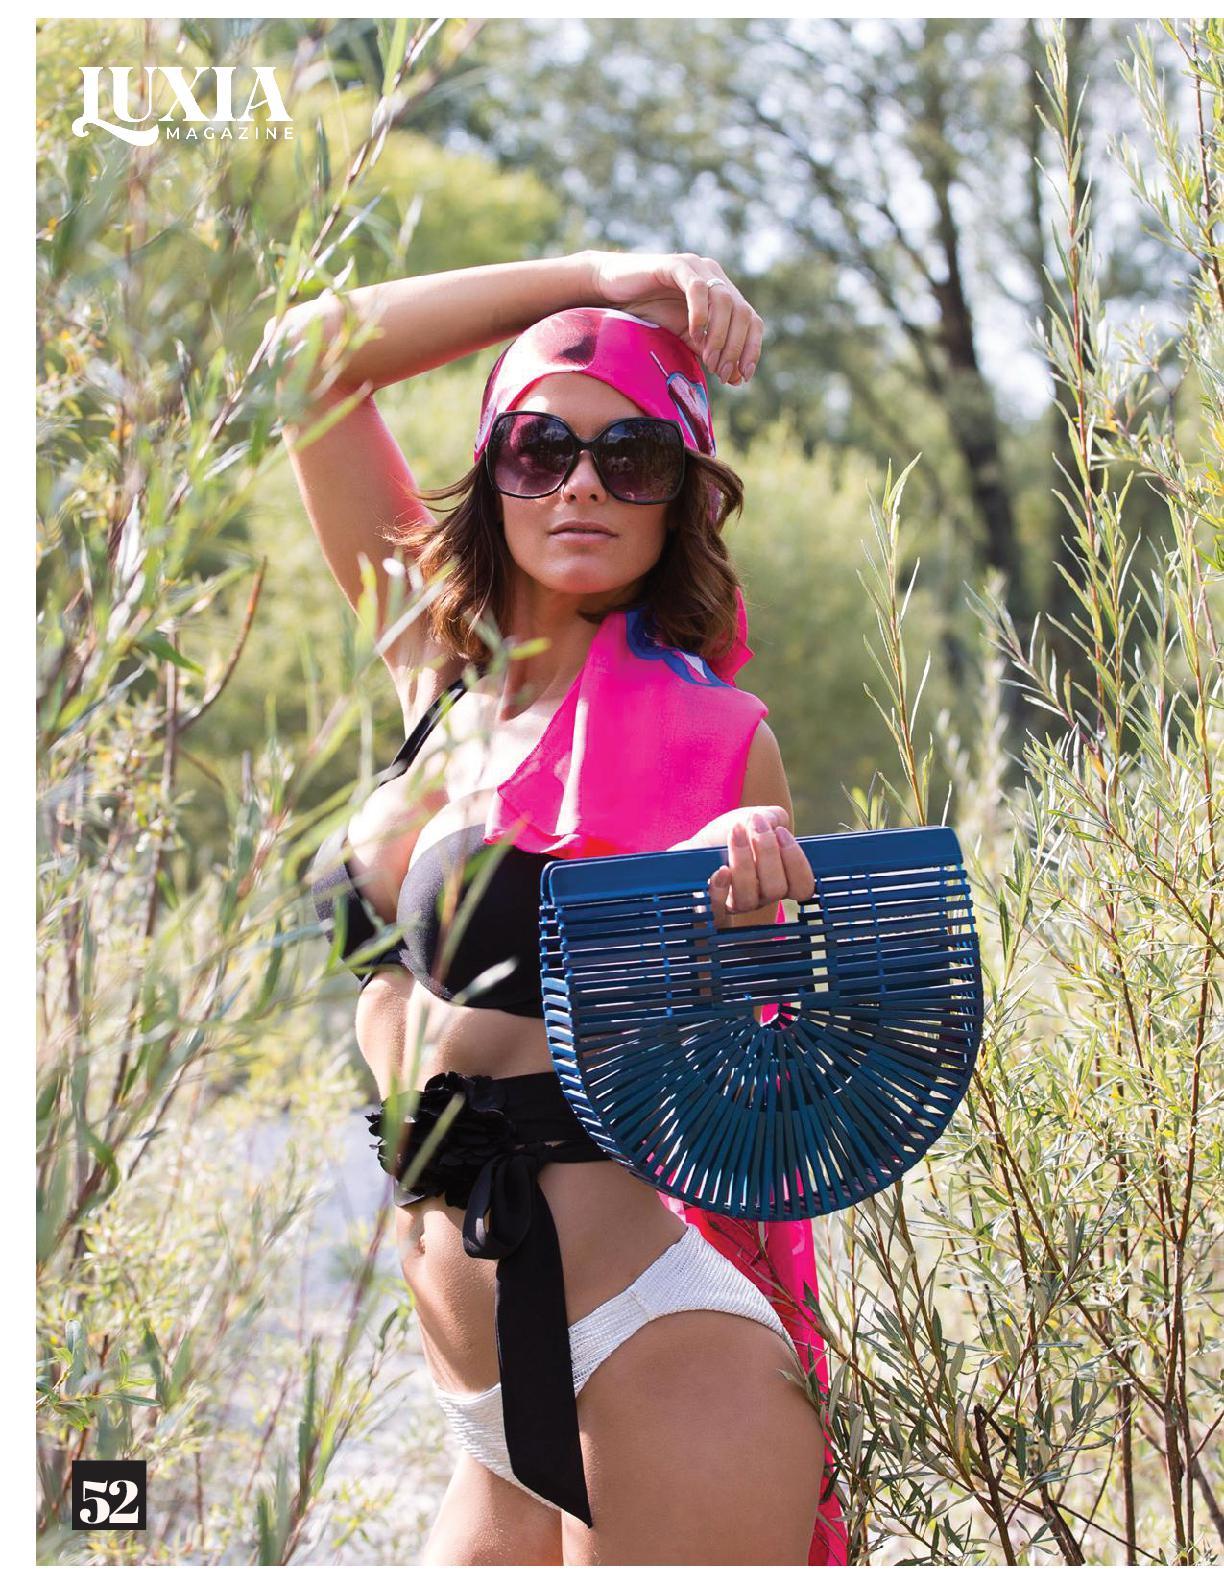 LUXIA, June 2021 Issue 097 - Fashion Stylist: Vesna Resch